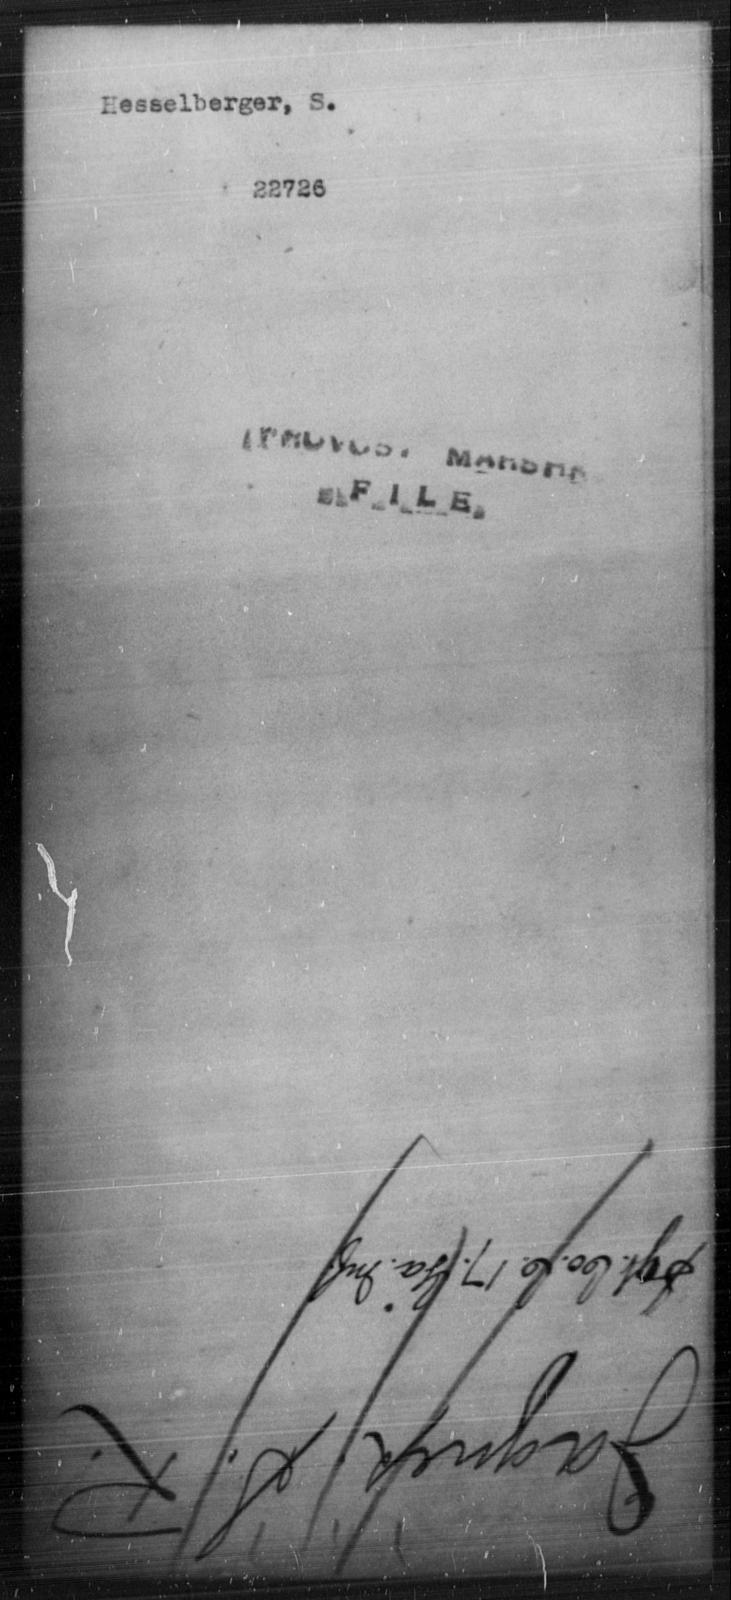 Hesselberger, S - State: [Blank] - Year: [Blank]